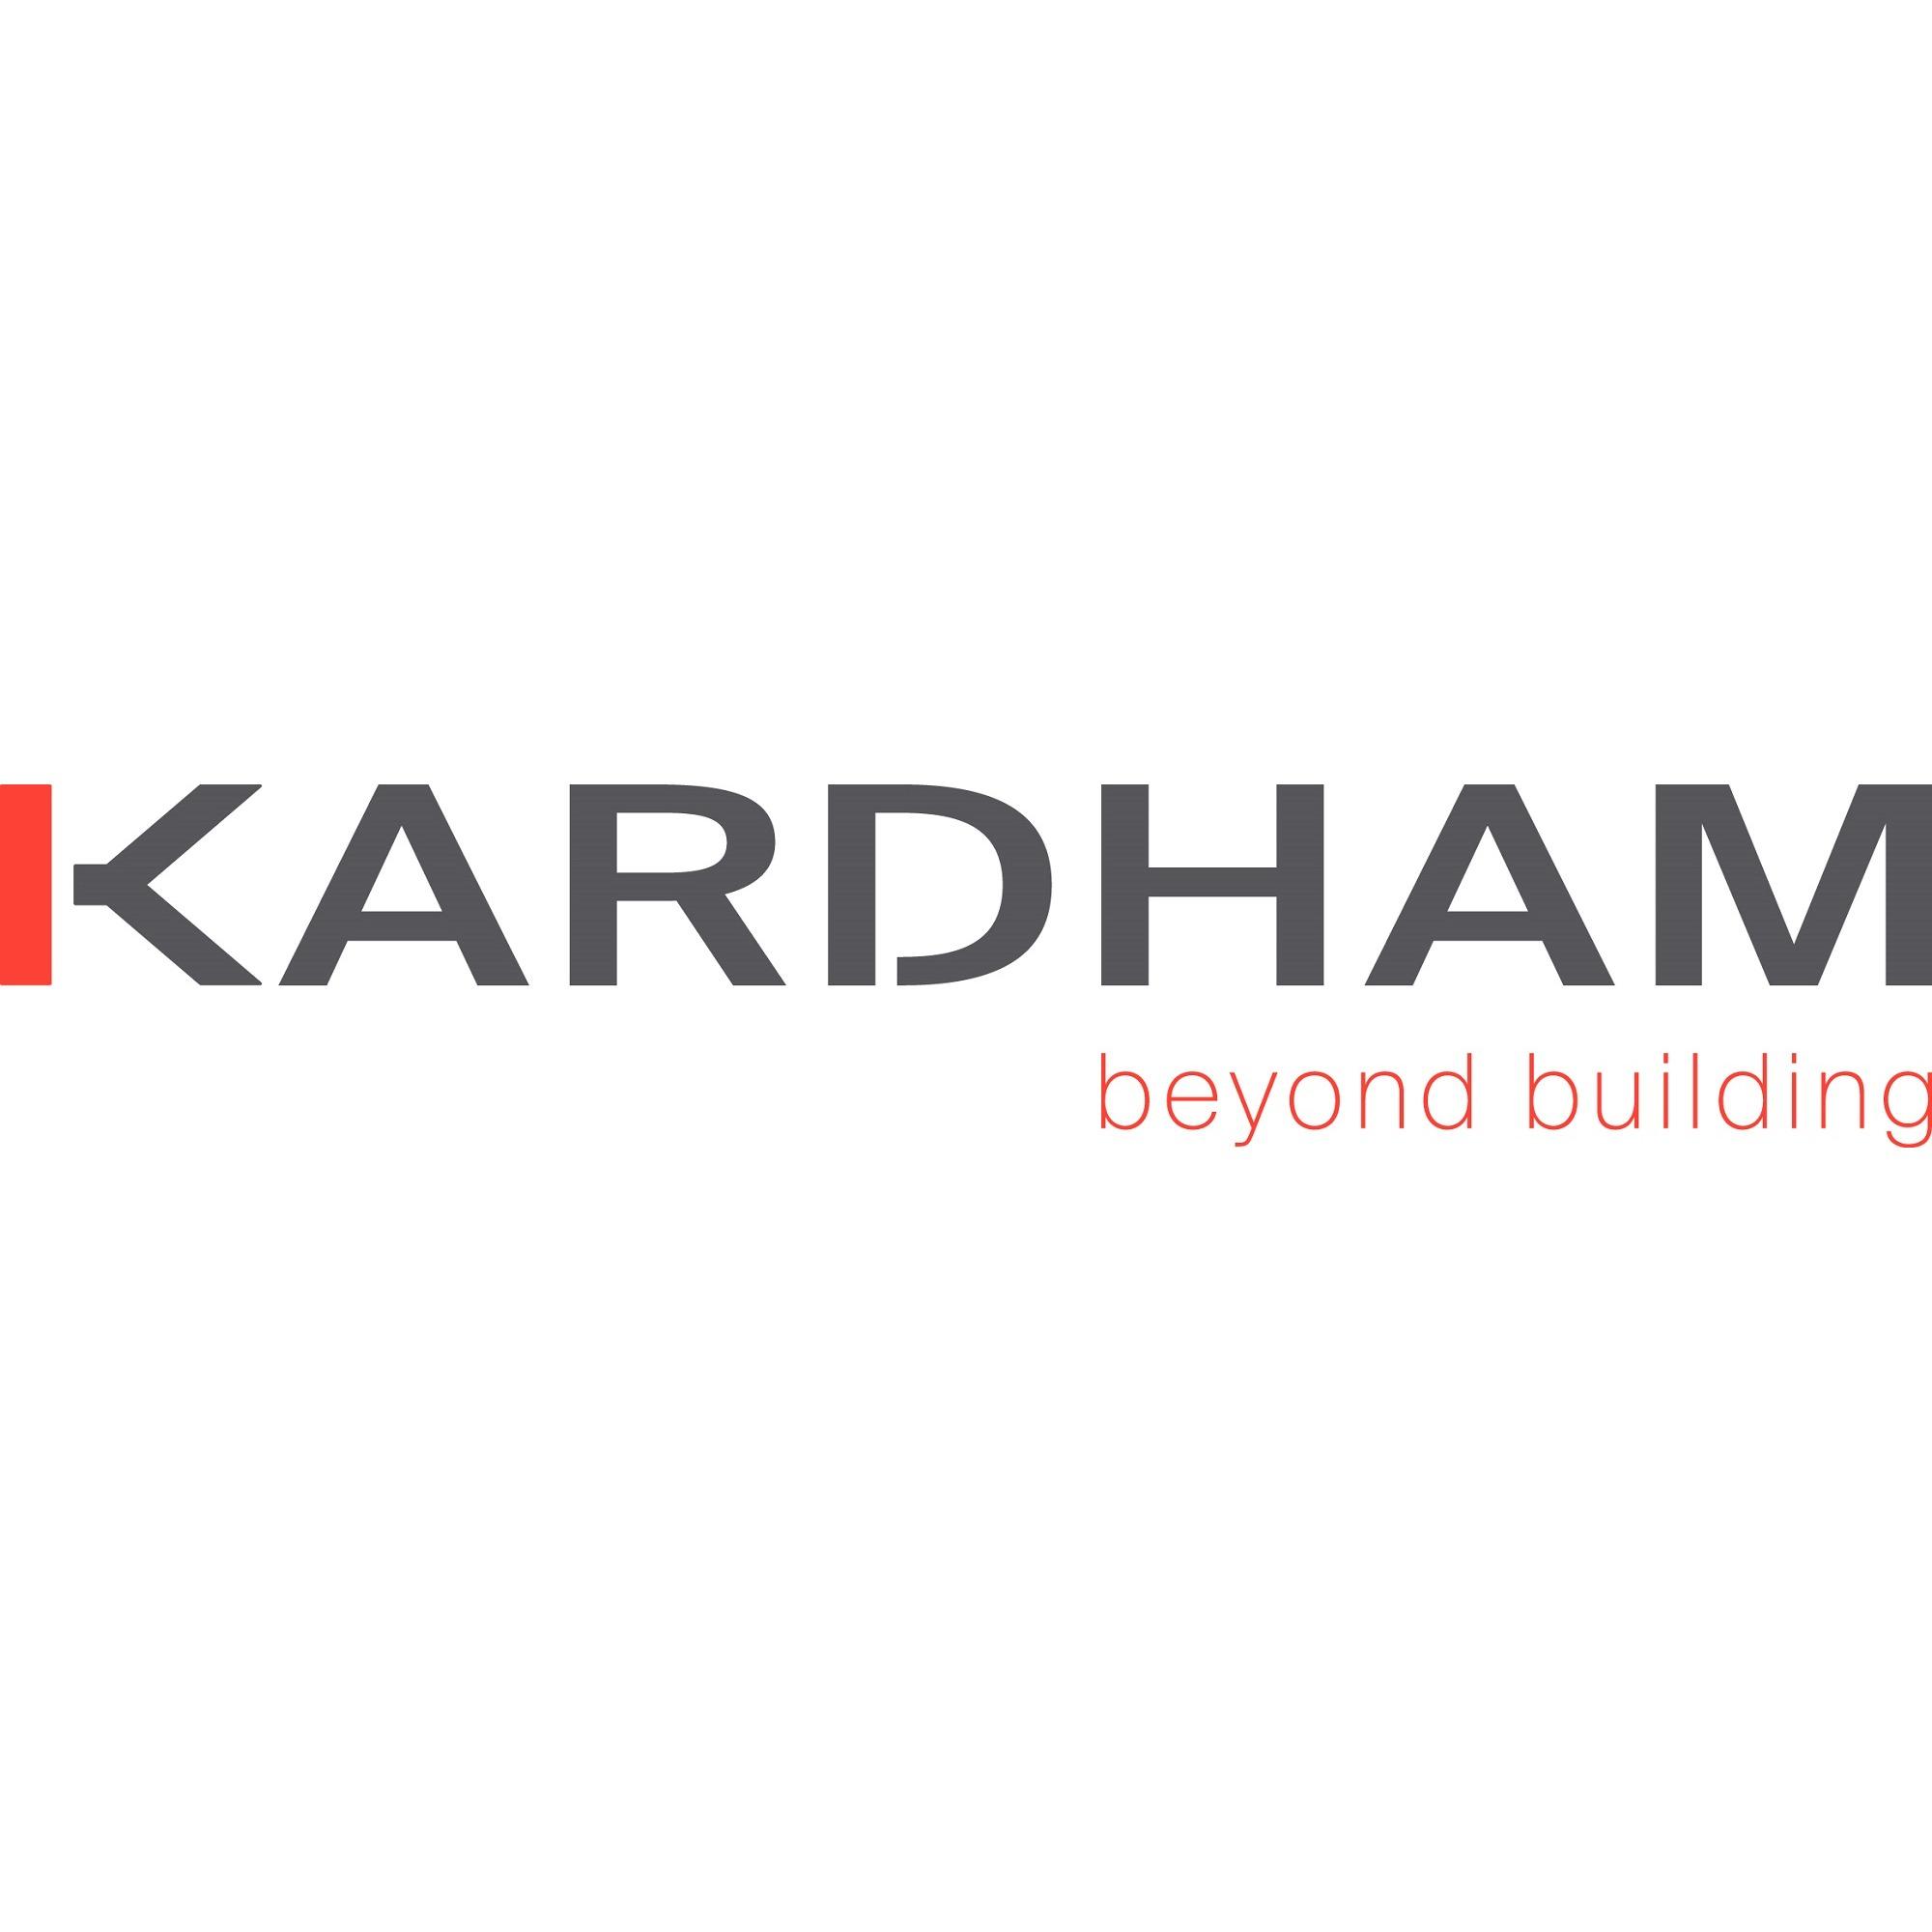 the Kardham logo.